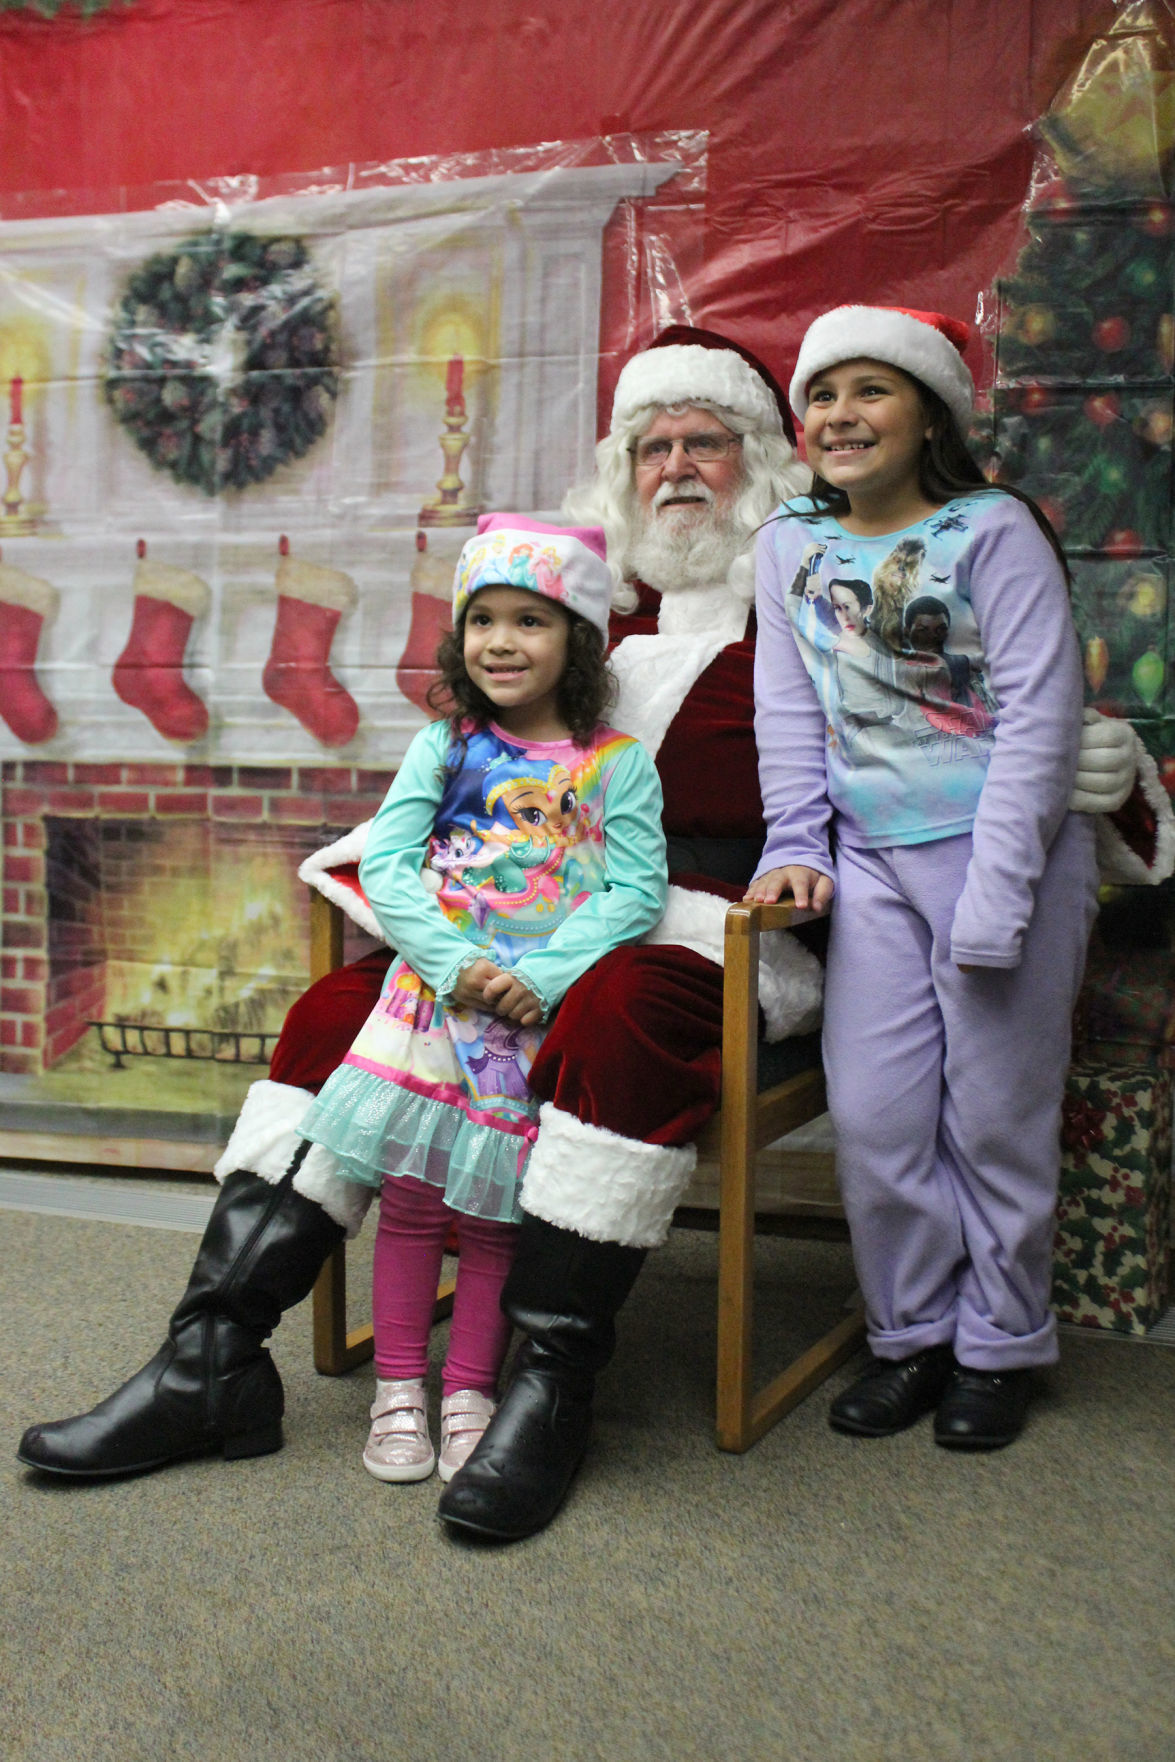 Santa: Picture time